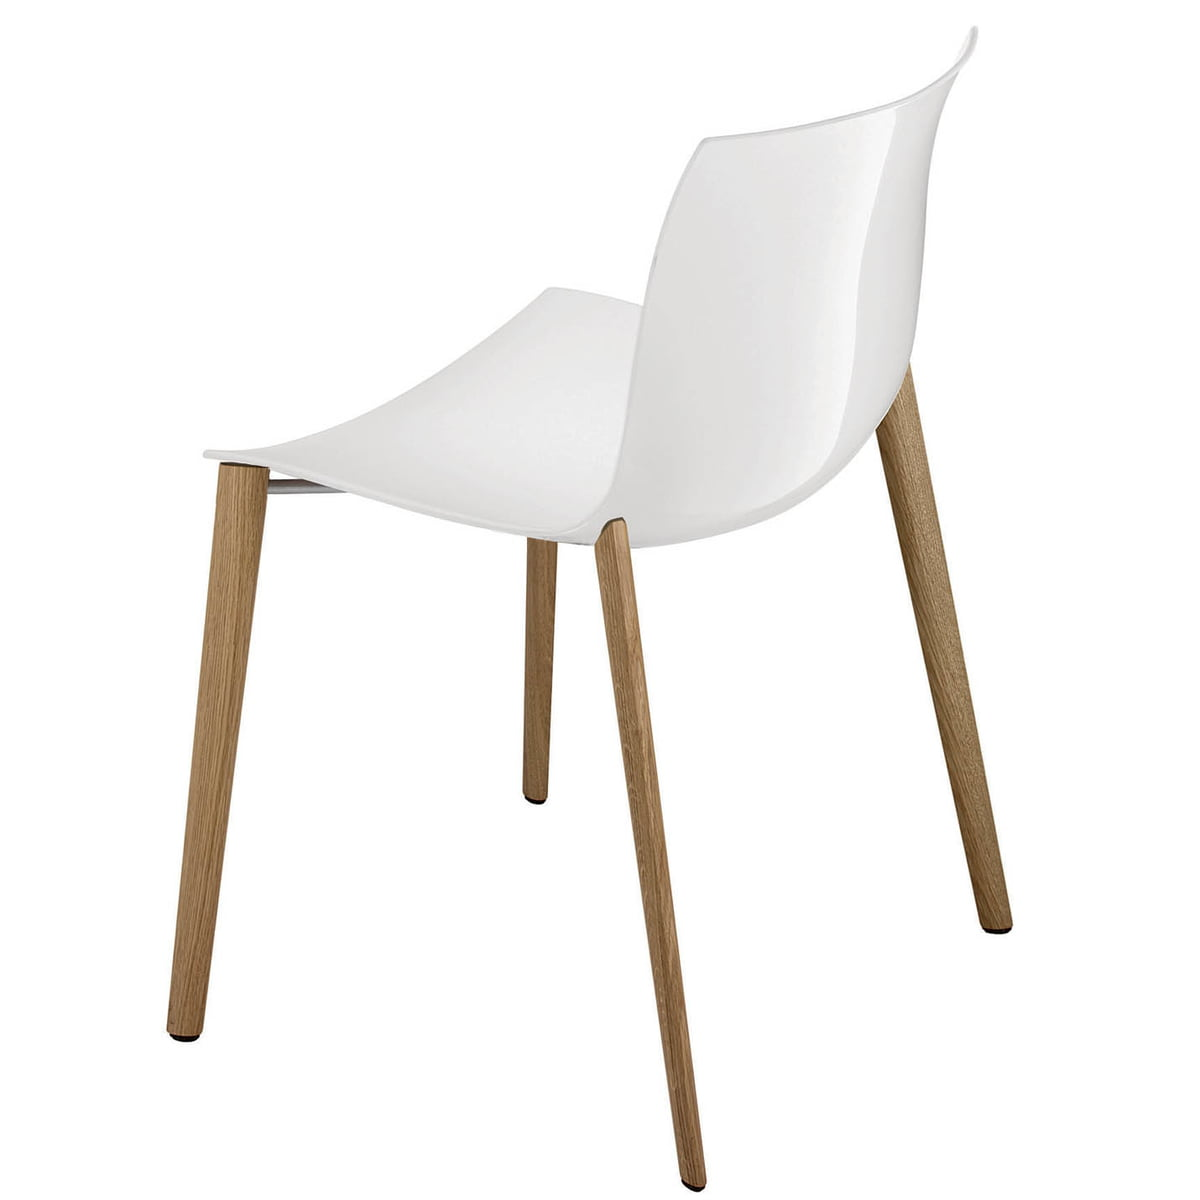 arper. arper aston swivel chair with arper. amazing arper ply